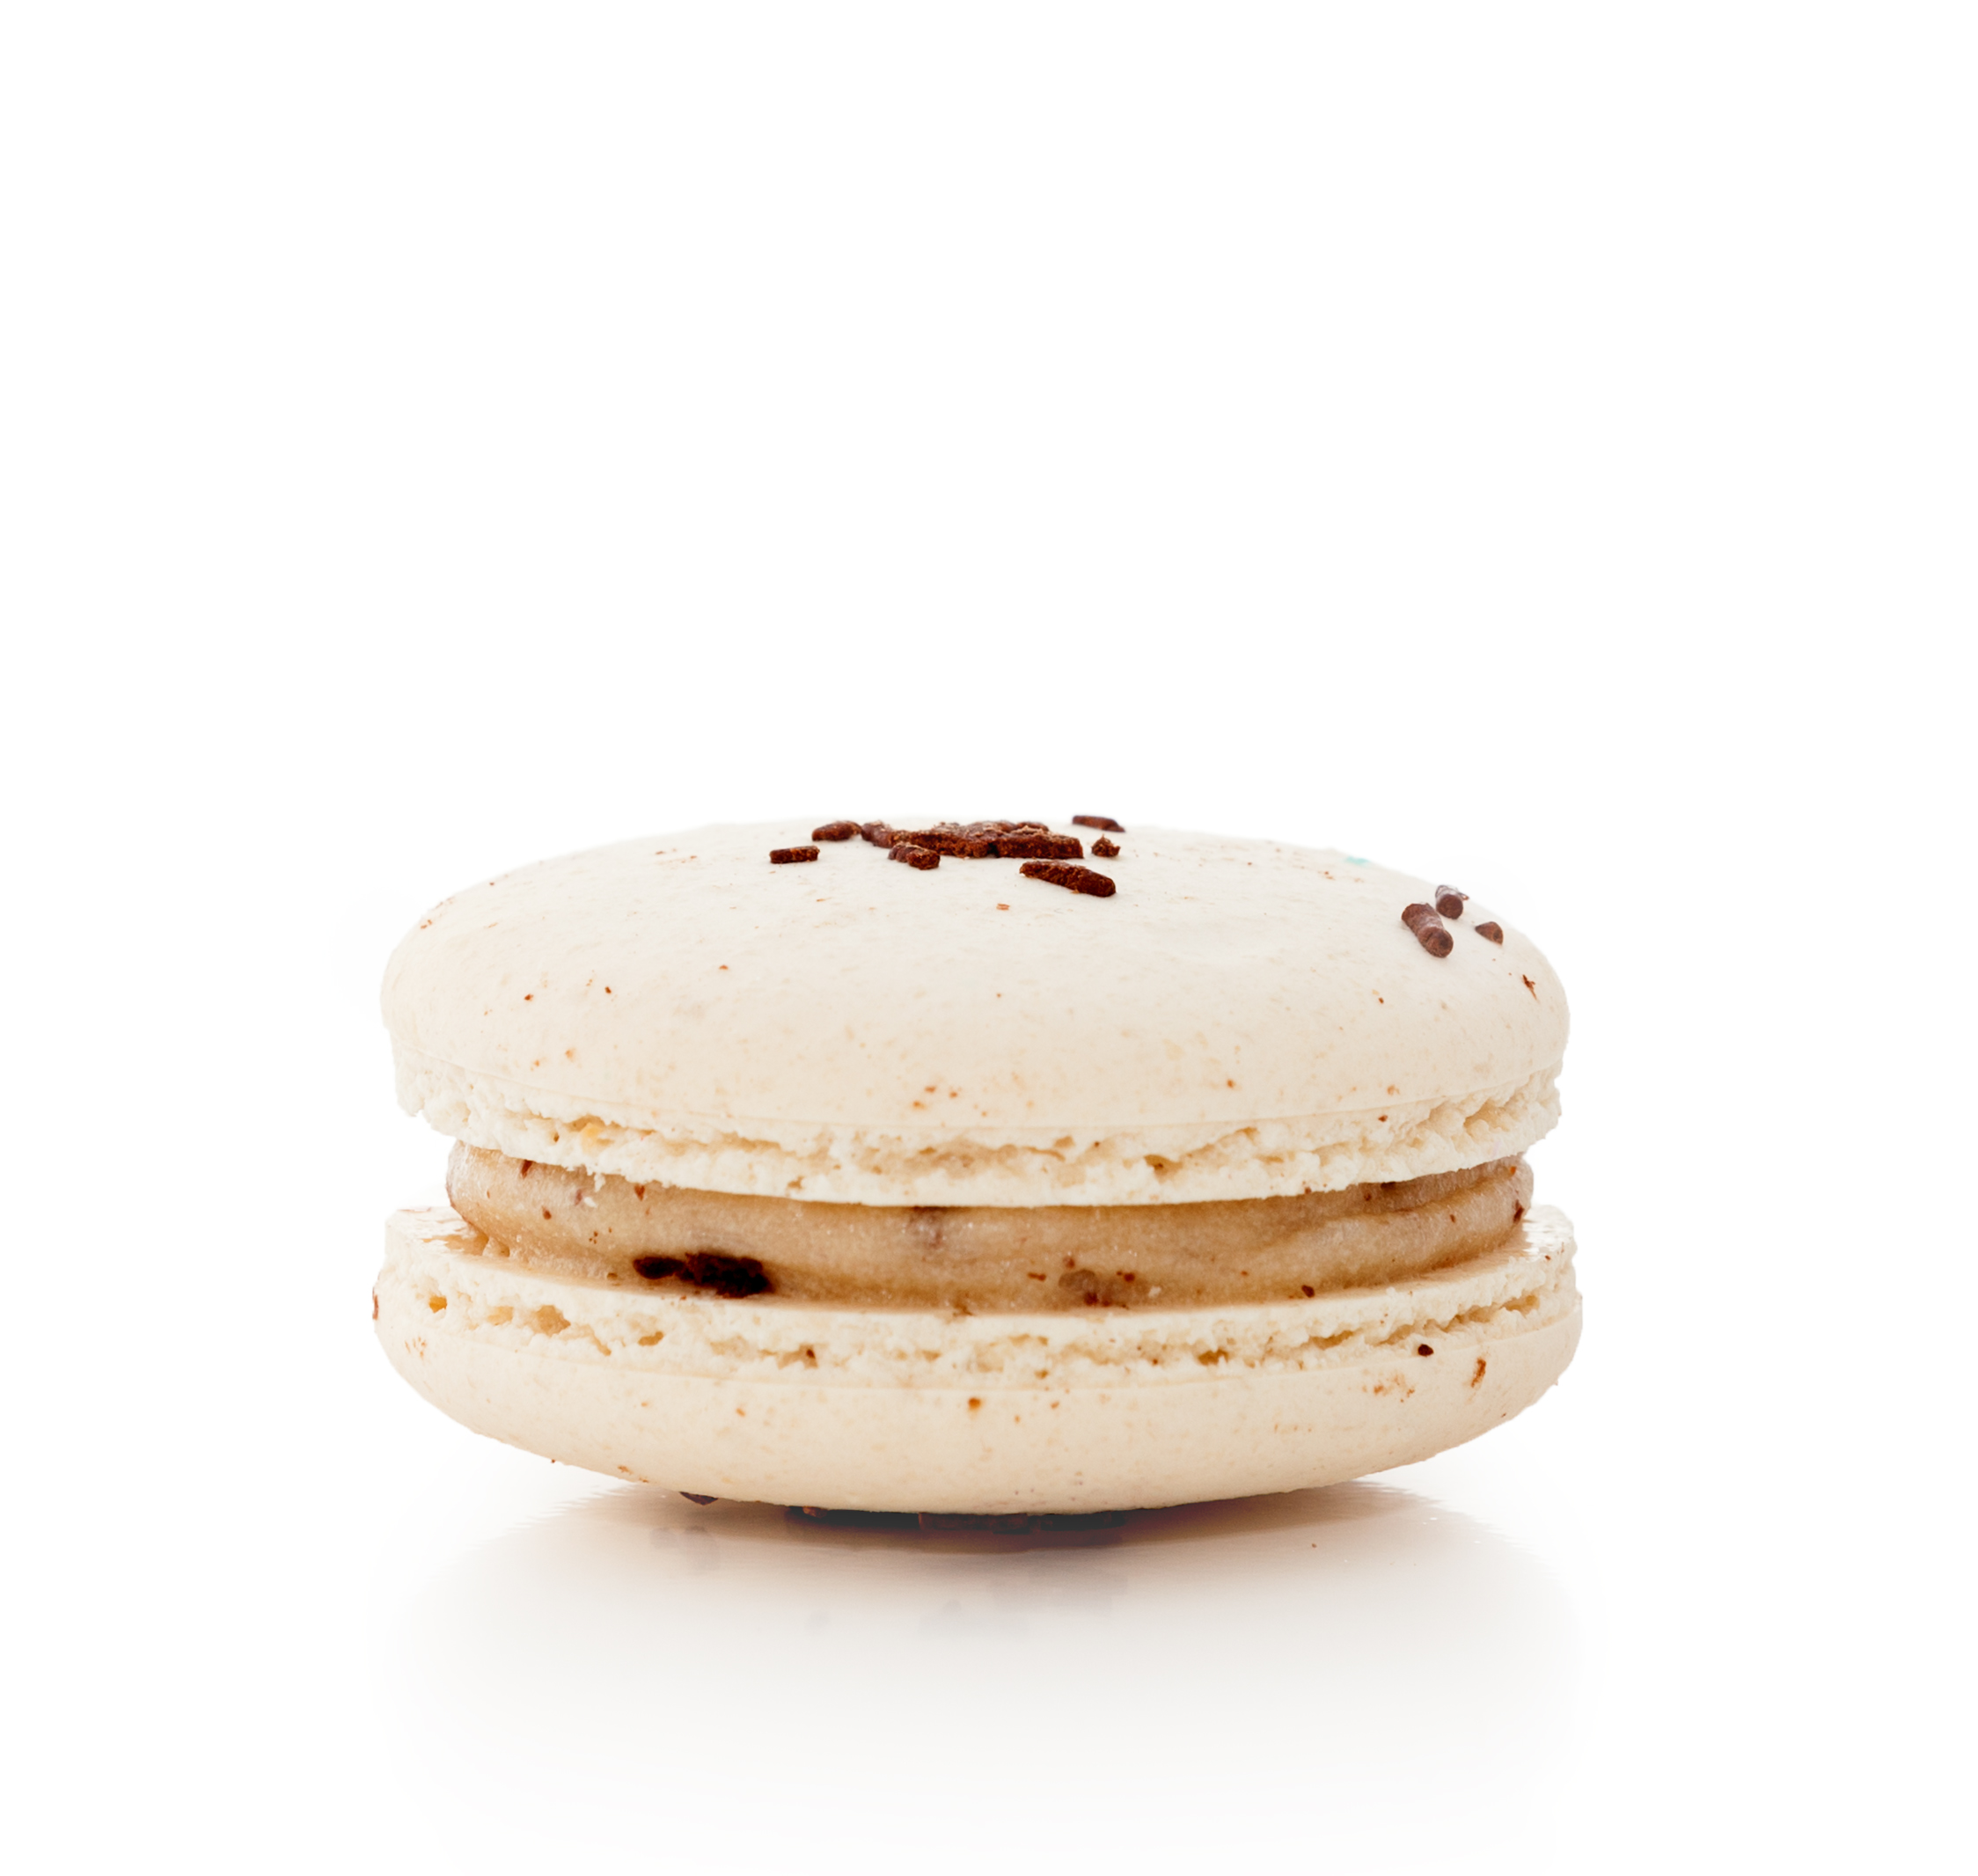 - Cookie DoughHomemade, gluten-free chocolate chip cookie dough